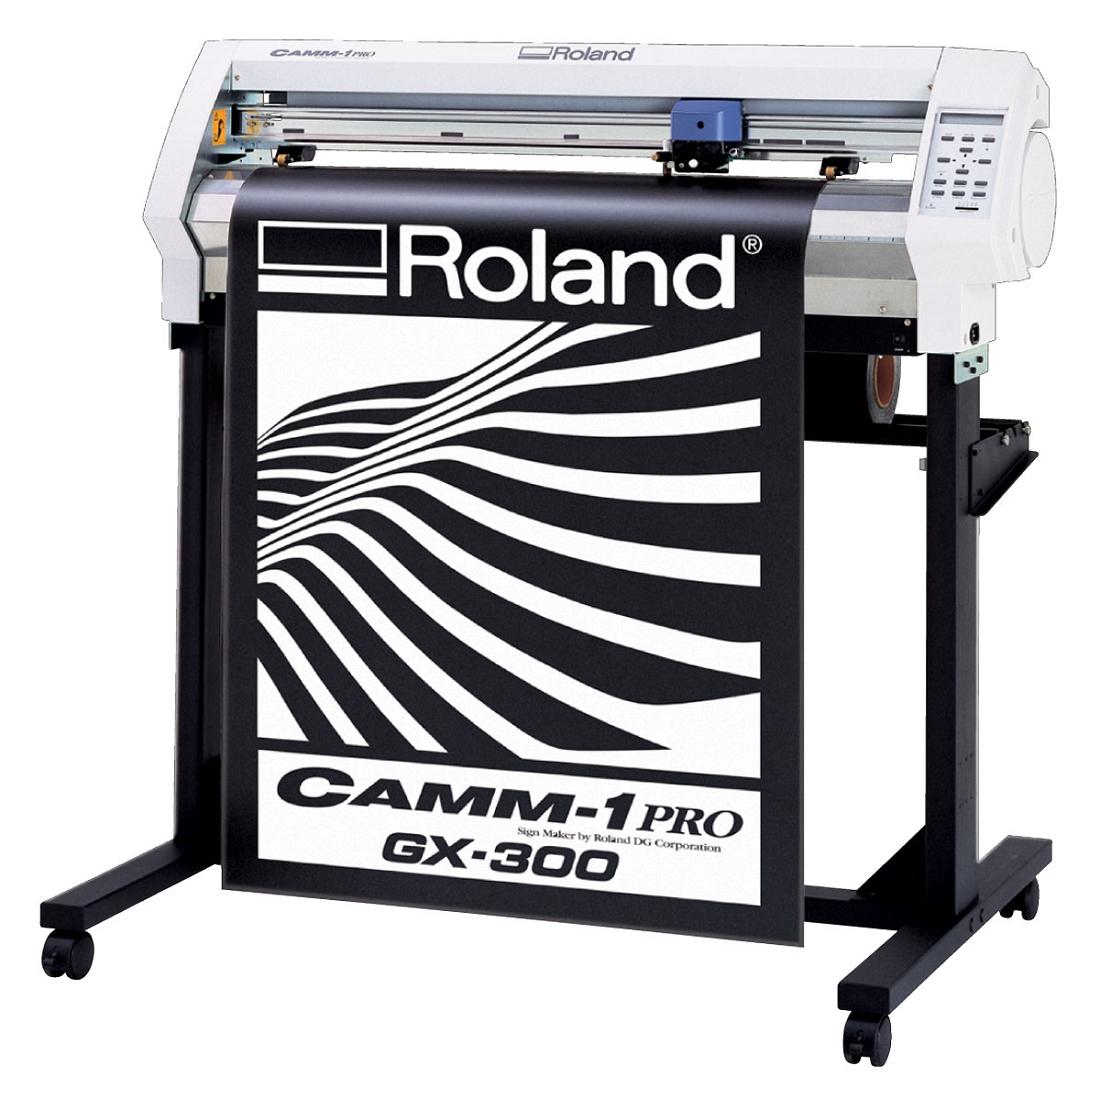 Roland Gx 300 Vinyl Cutter Plotter